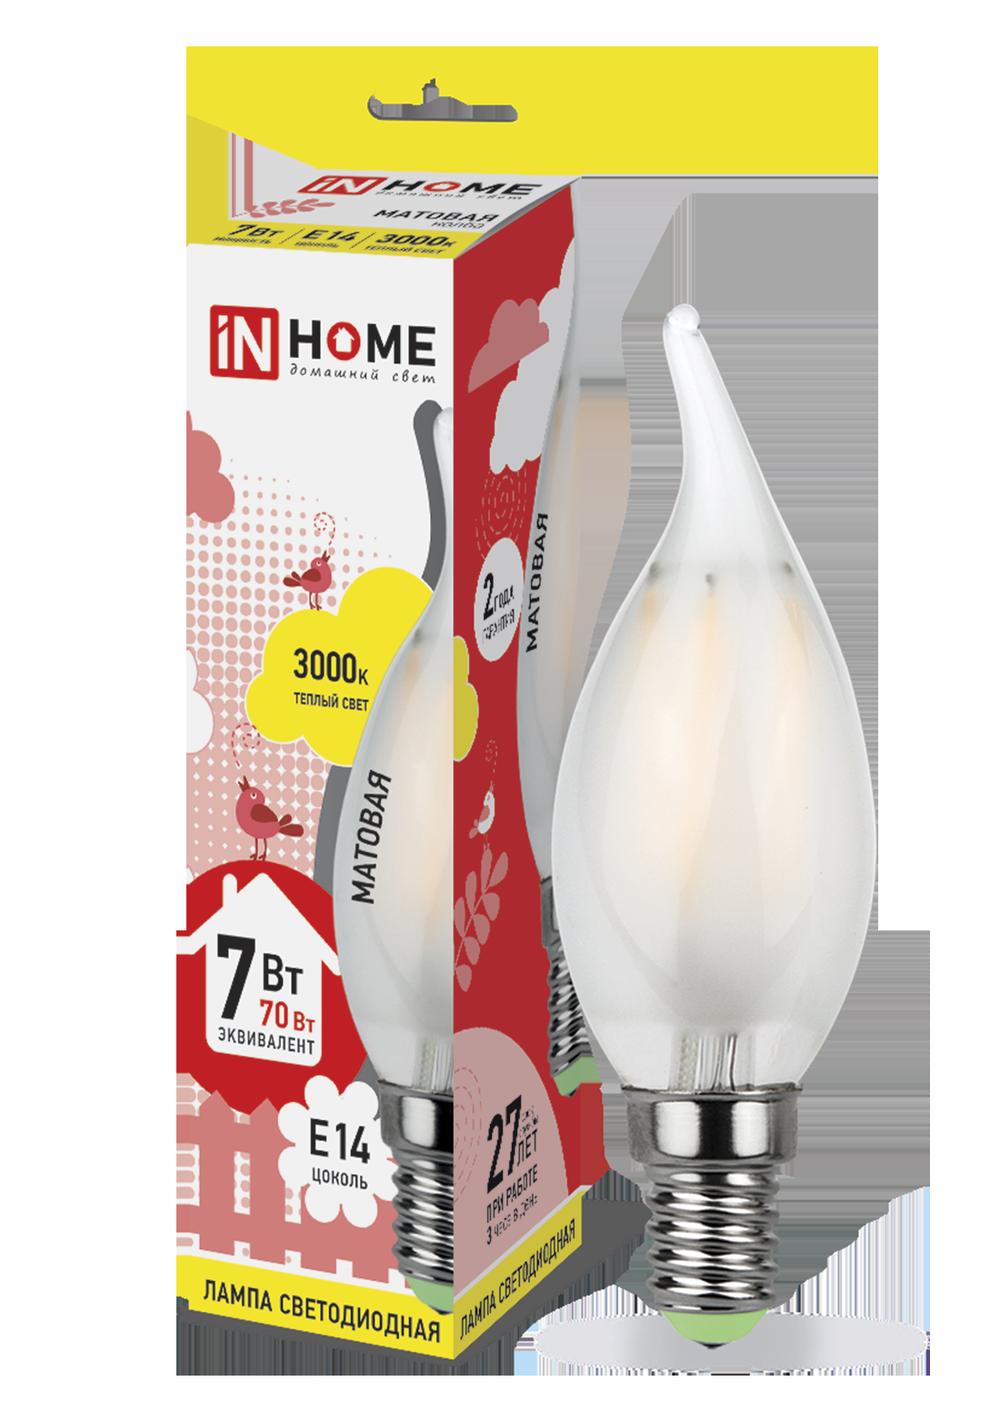 Лампа светодиодная LED-СВЕЧА НА ВЕТРУ-deco 7Вт 230В Е14 3000К 630Лм матовая IN HOME